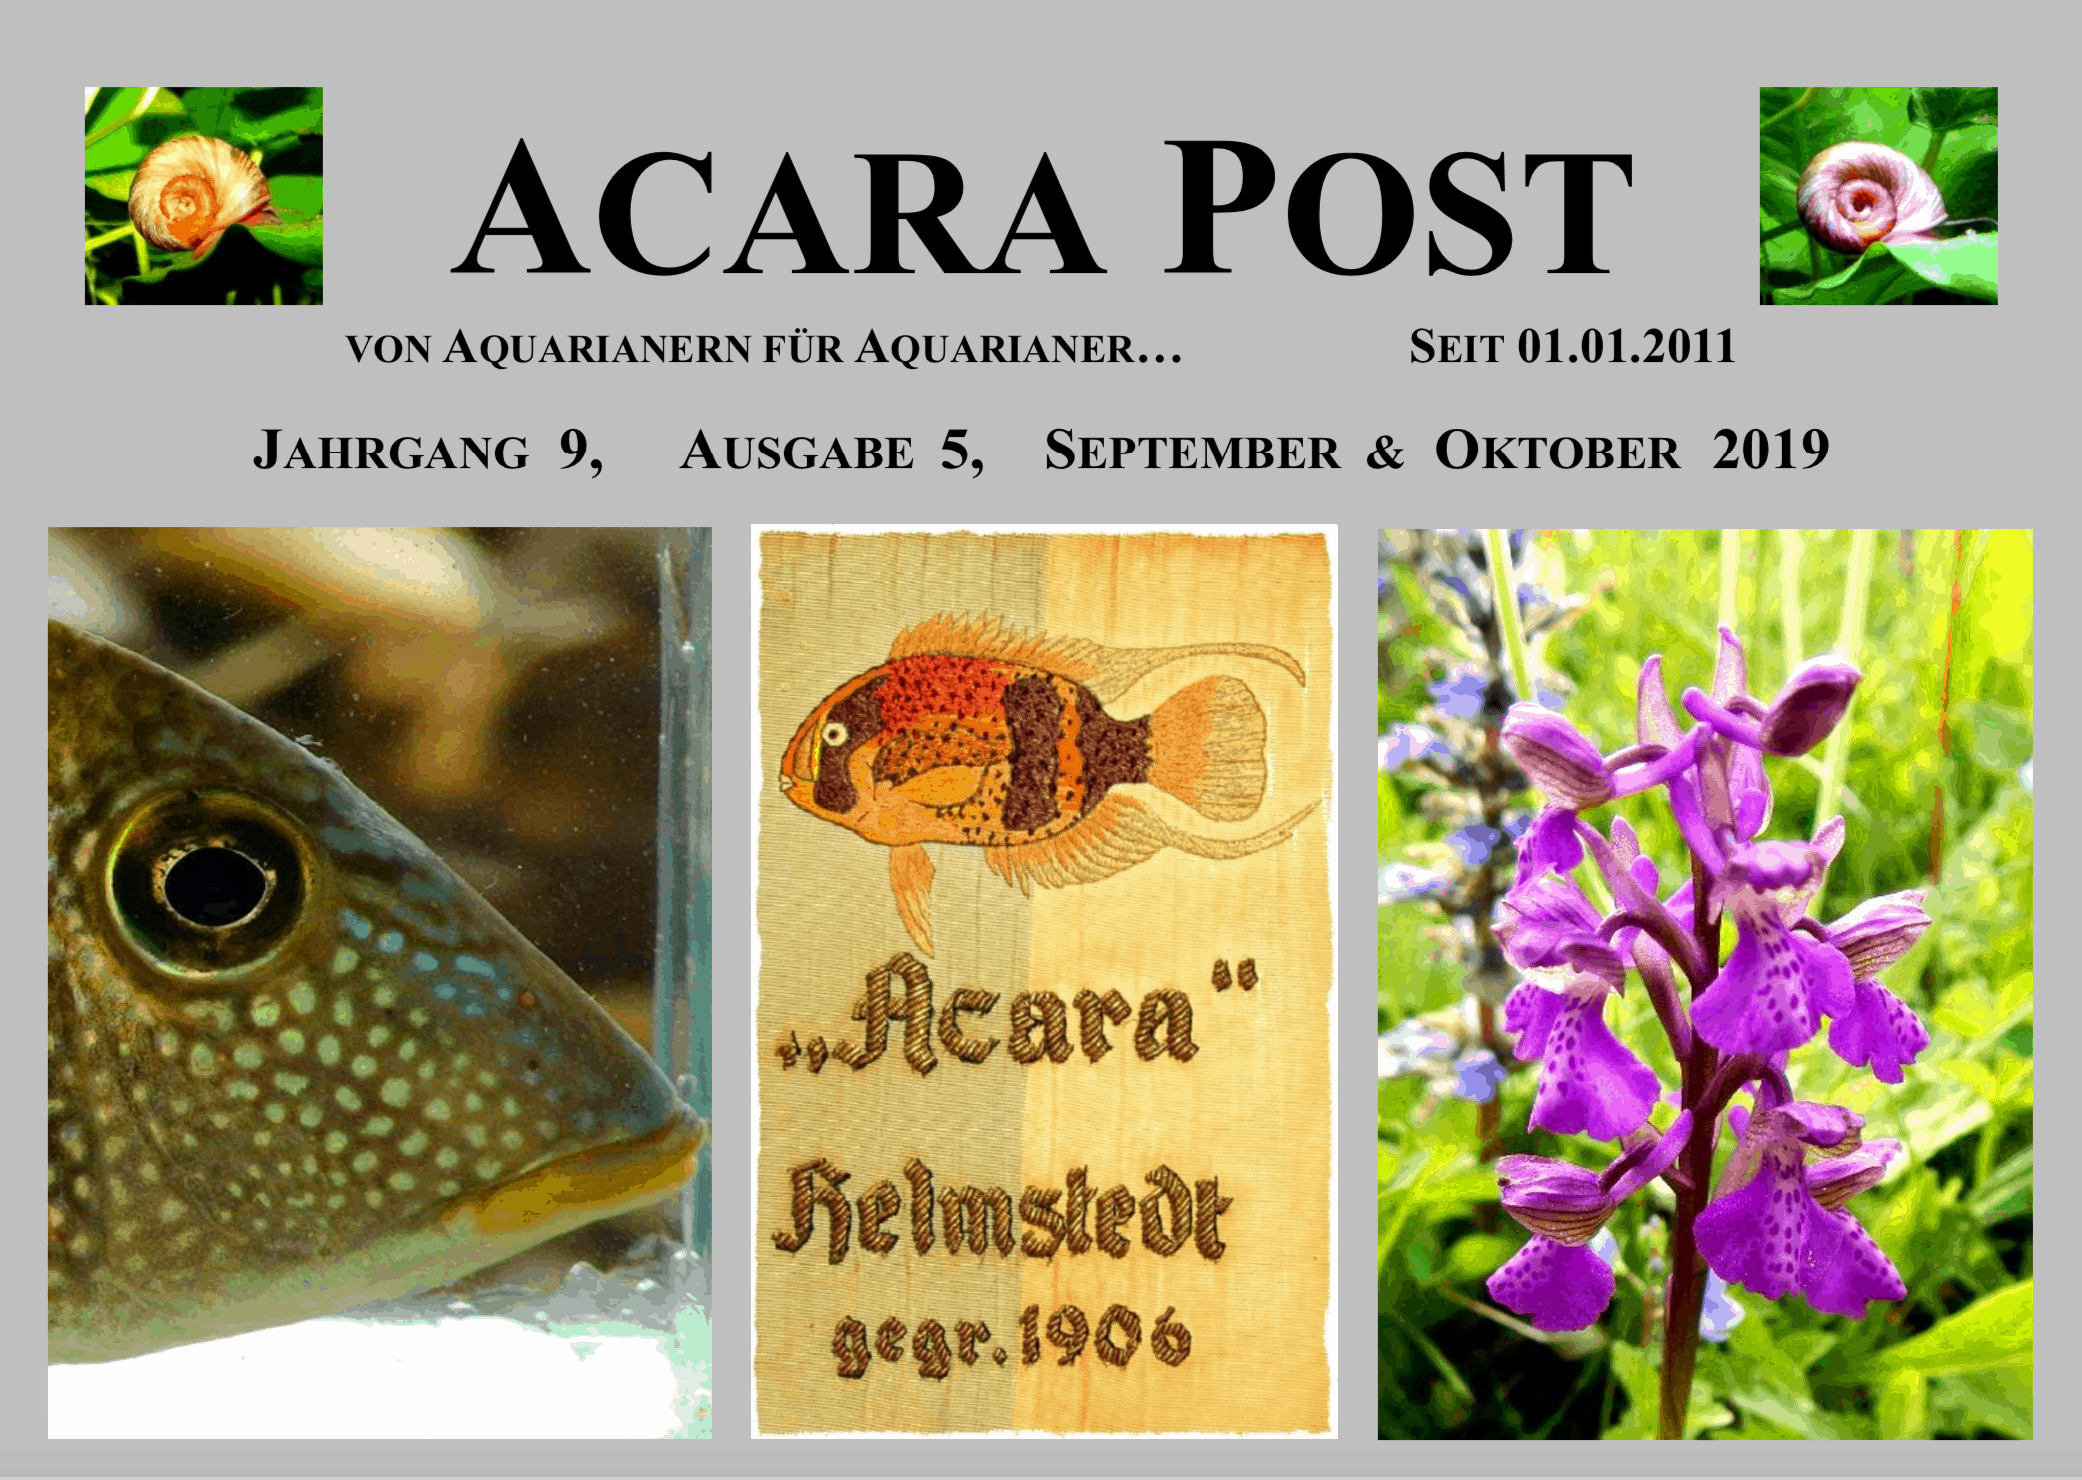 Acara-Post September & Oktober 2019 - jetzt kostenlos lesen